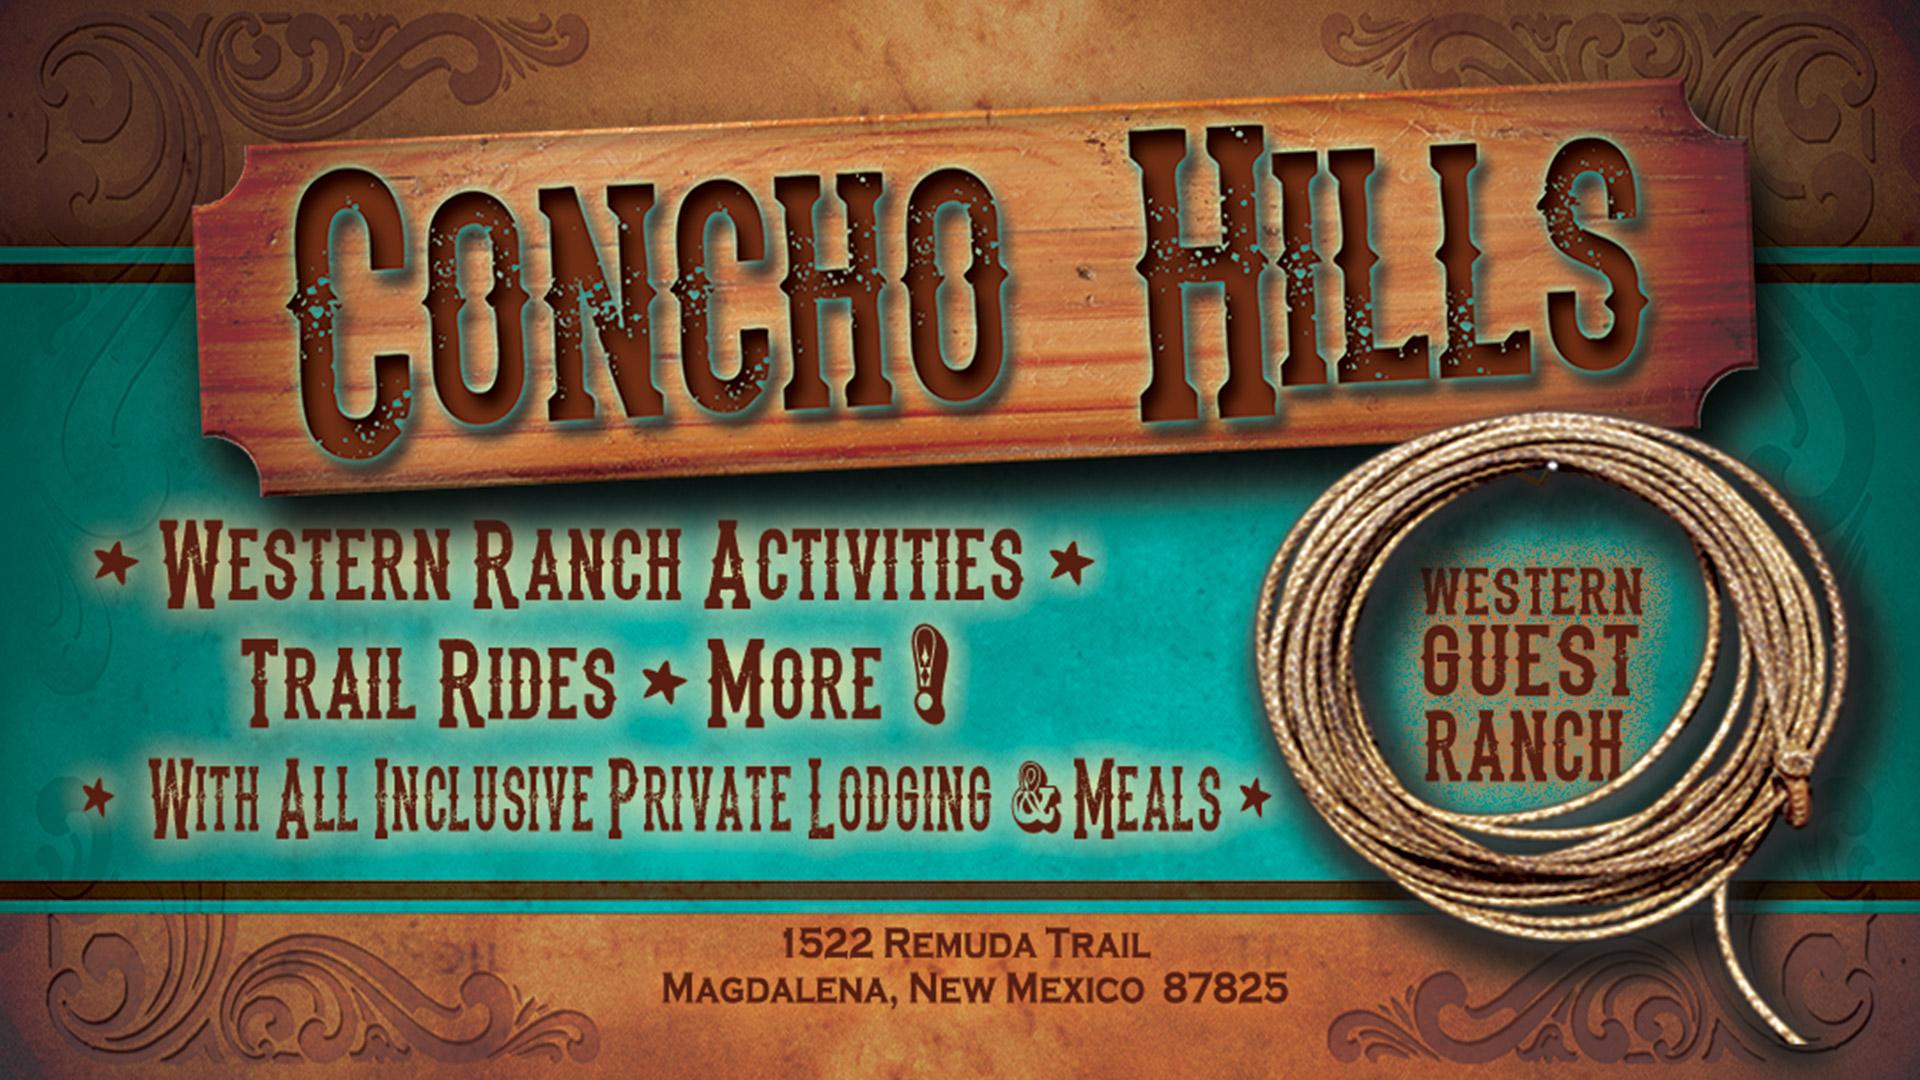 Concho Hills Guest Ranch Logo